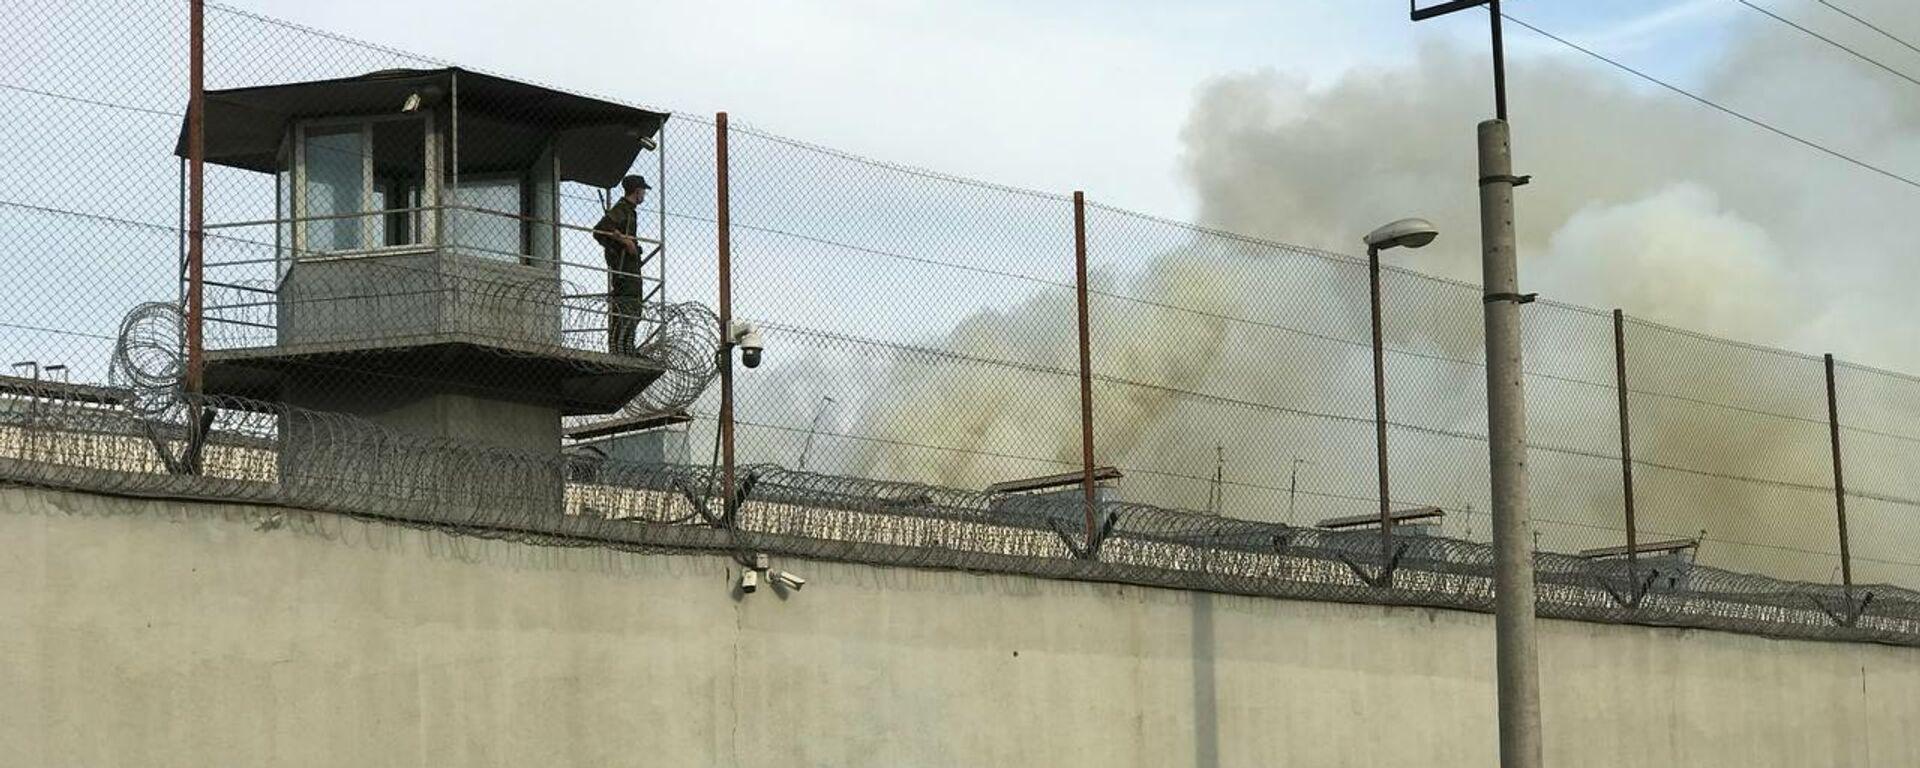 Пожар в Руставской тюрьме - Sputnik საქართველო, 1920, 14.10.2021